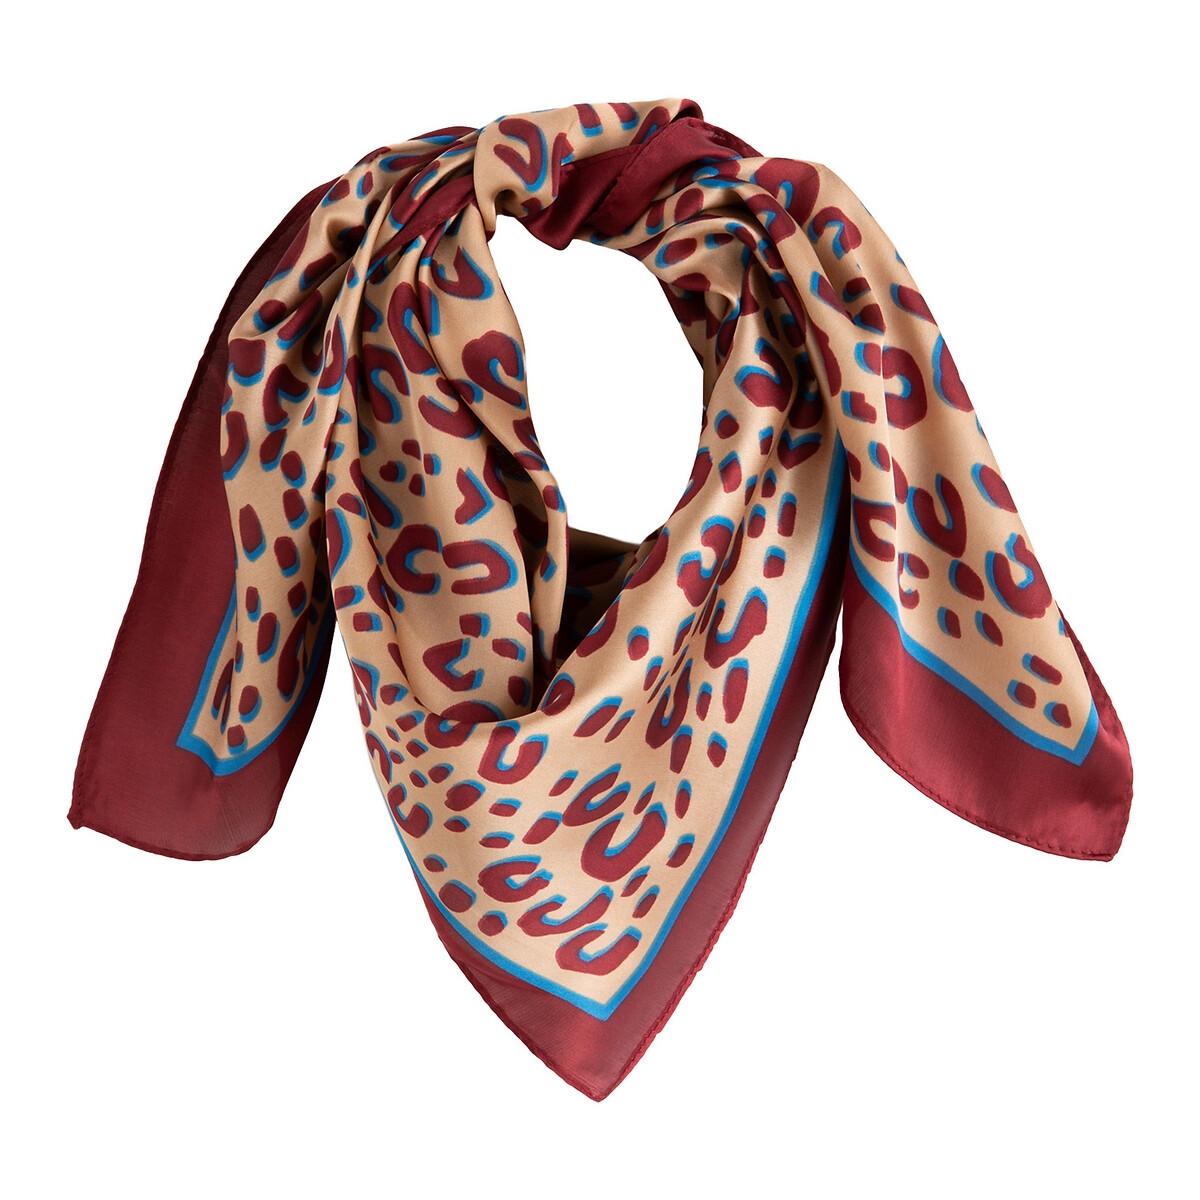 Foulard carré imprimé léopard